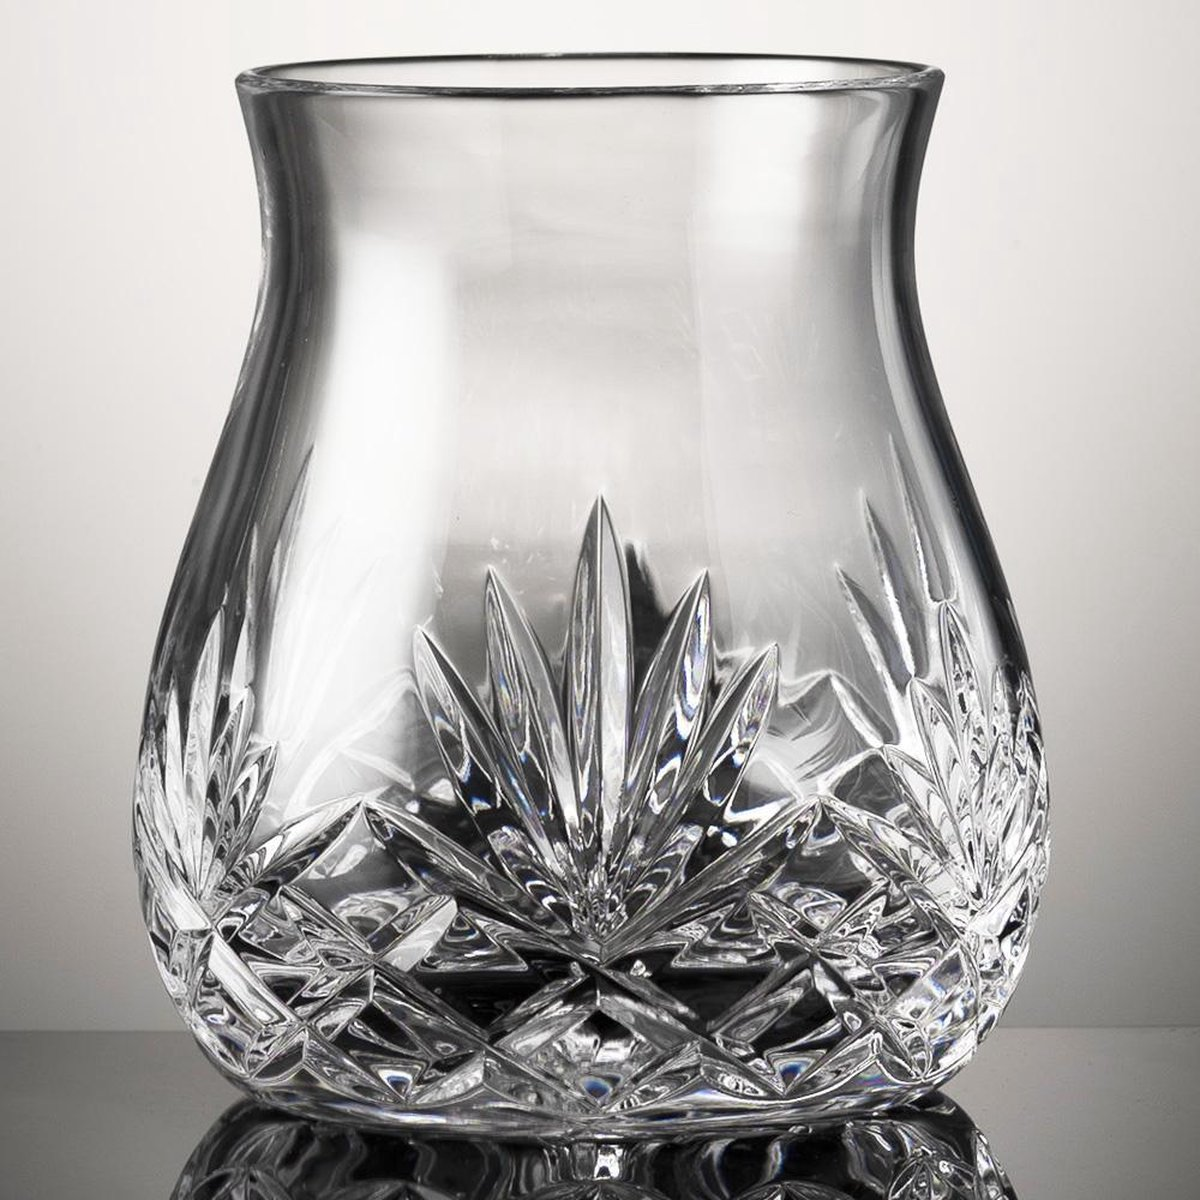 Bol Com Glencairn Cut Tumbler Luxe Whiskey Glas Handgemaakt Kristal Geschenkdoos